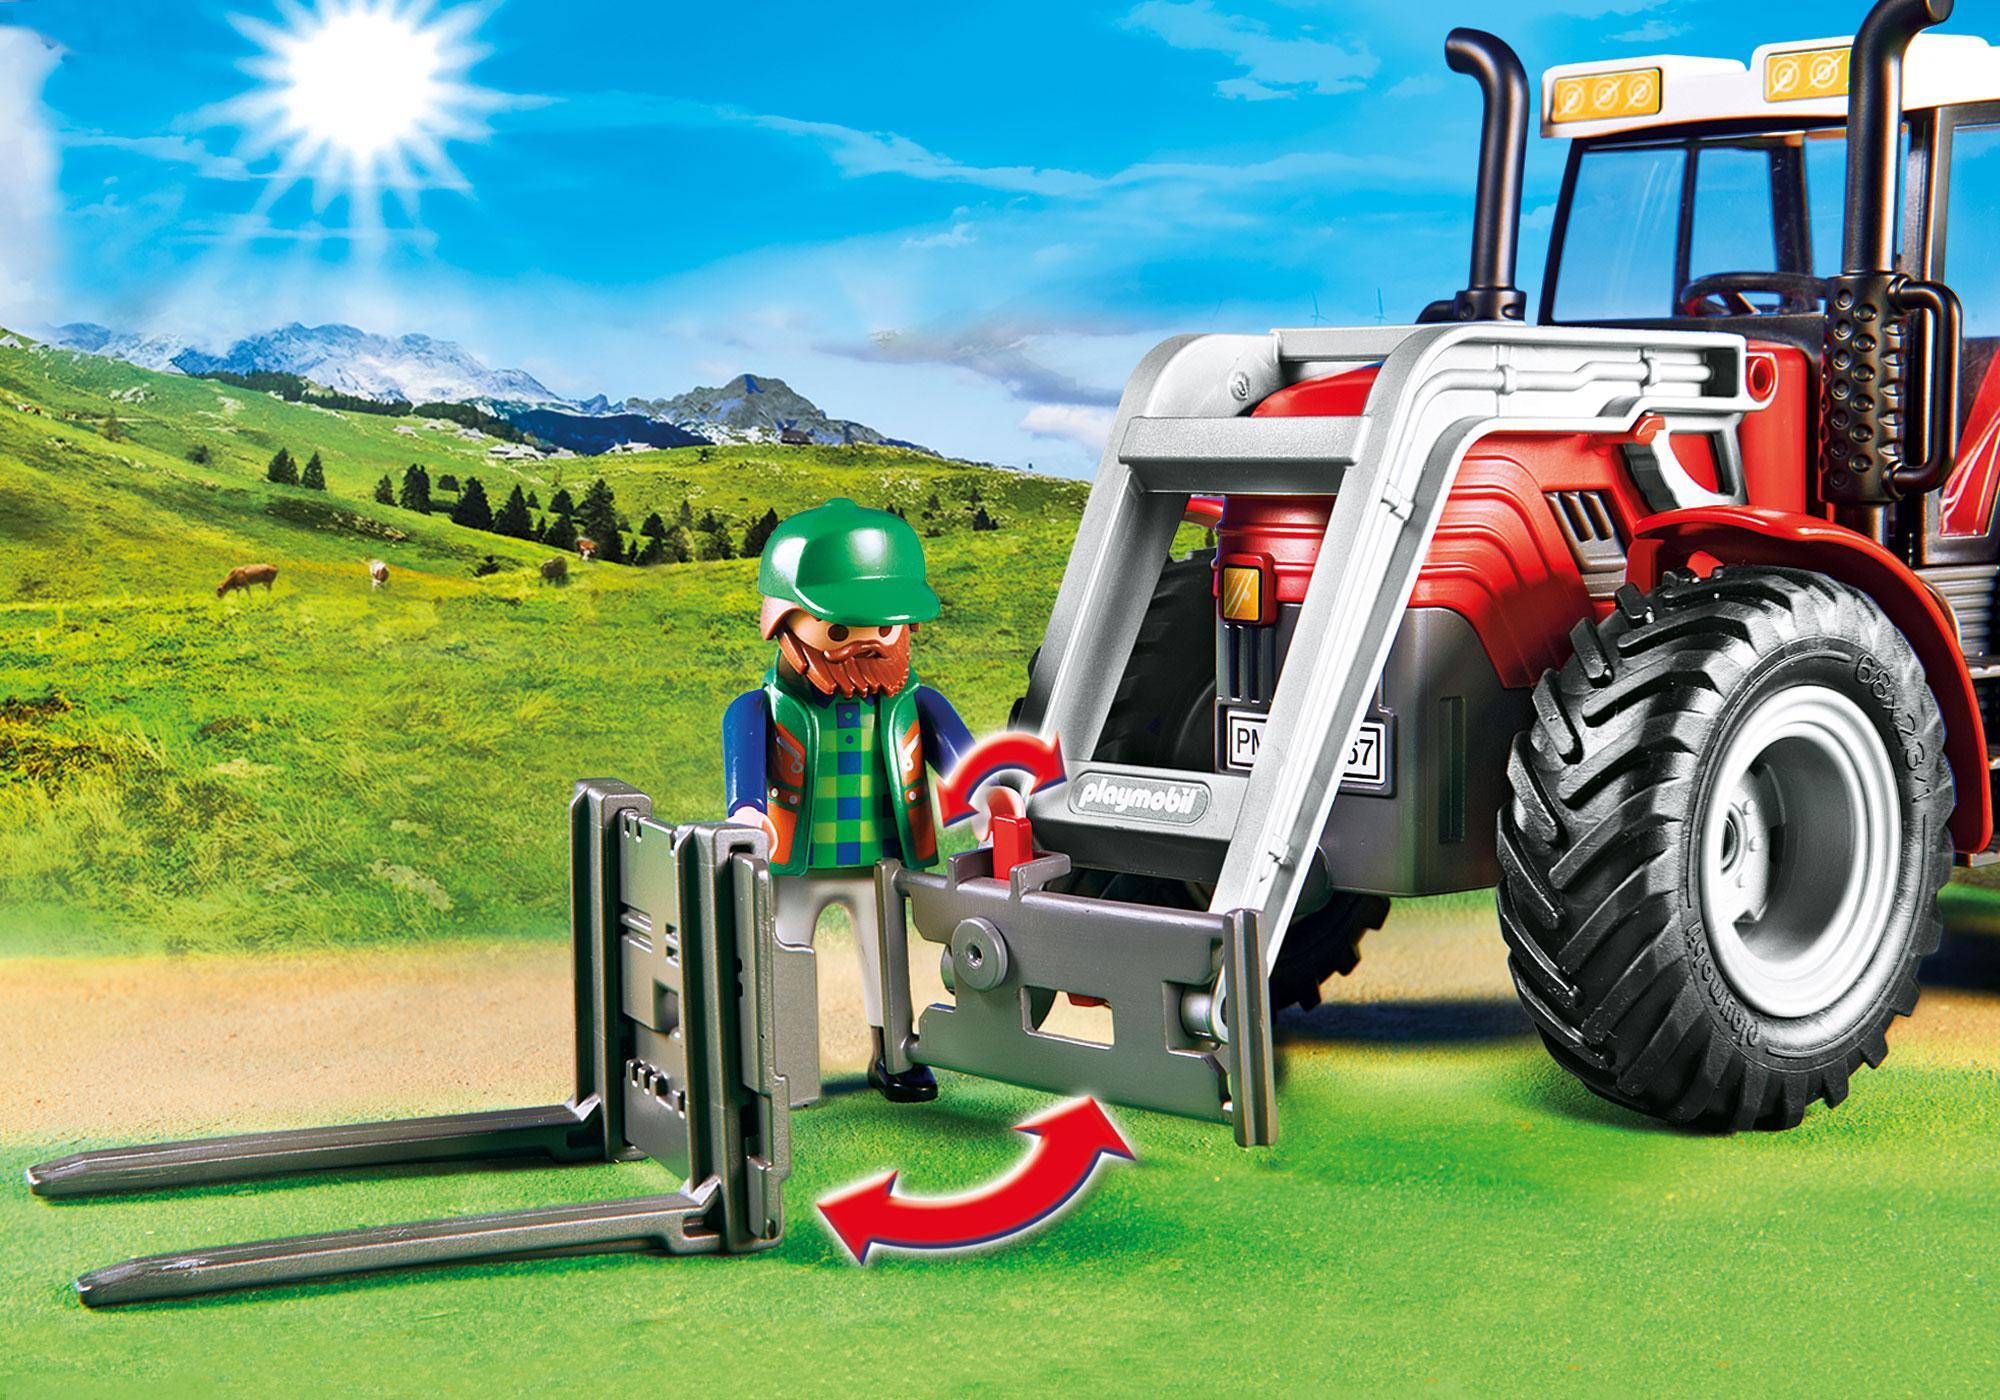 http://media.playmobil.com/i/playmobil/6867_product_extra2/Tractor